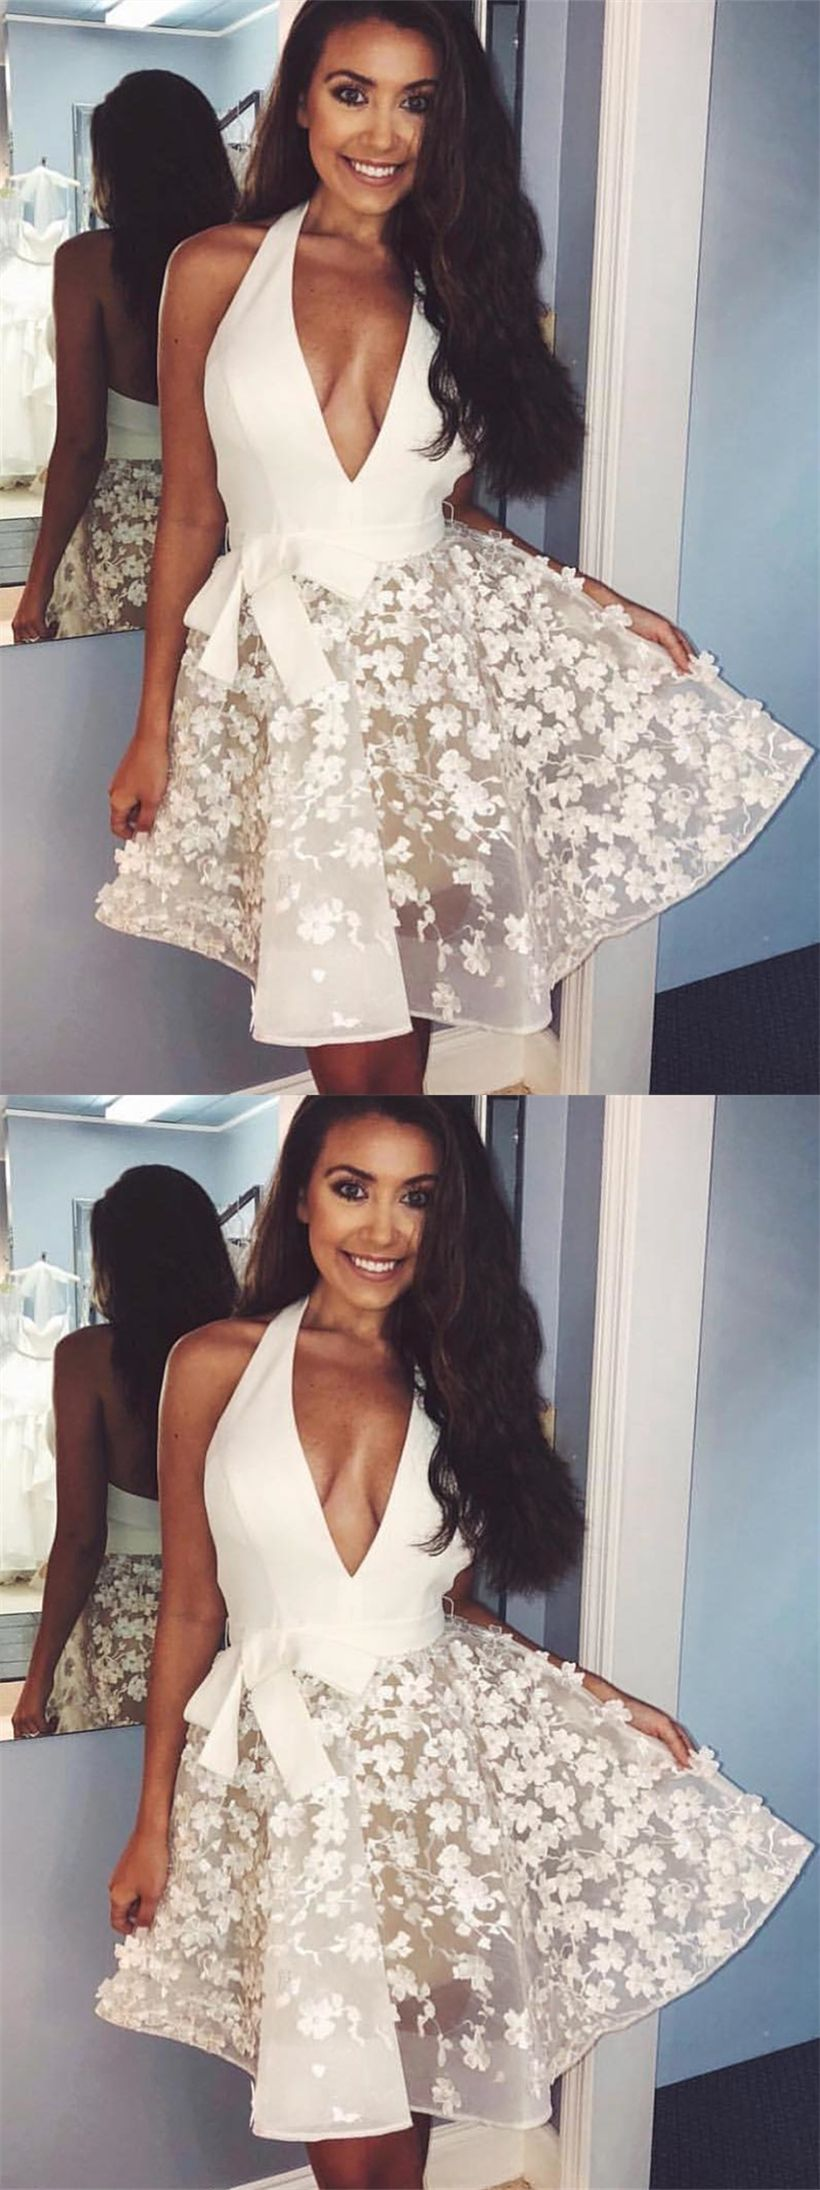 Aline halter backless aboveknee white homecoming dress with